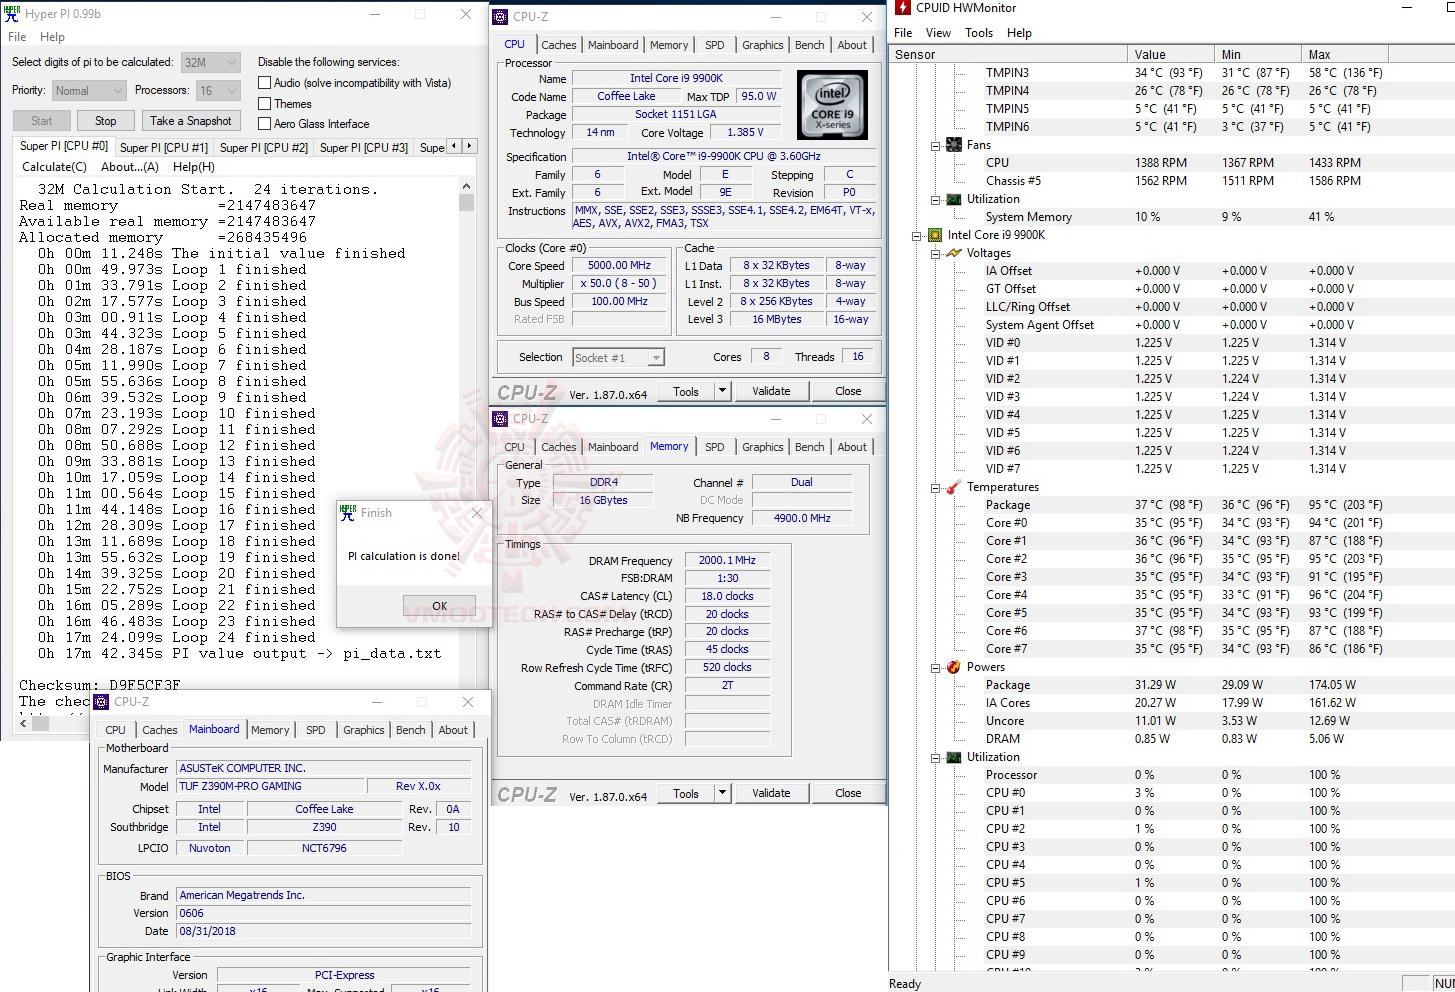 h32 1 ASUS TUF Z390M PRO GAMING REVIEW